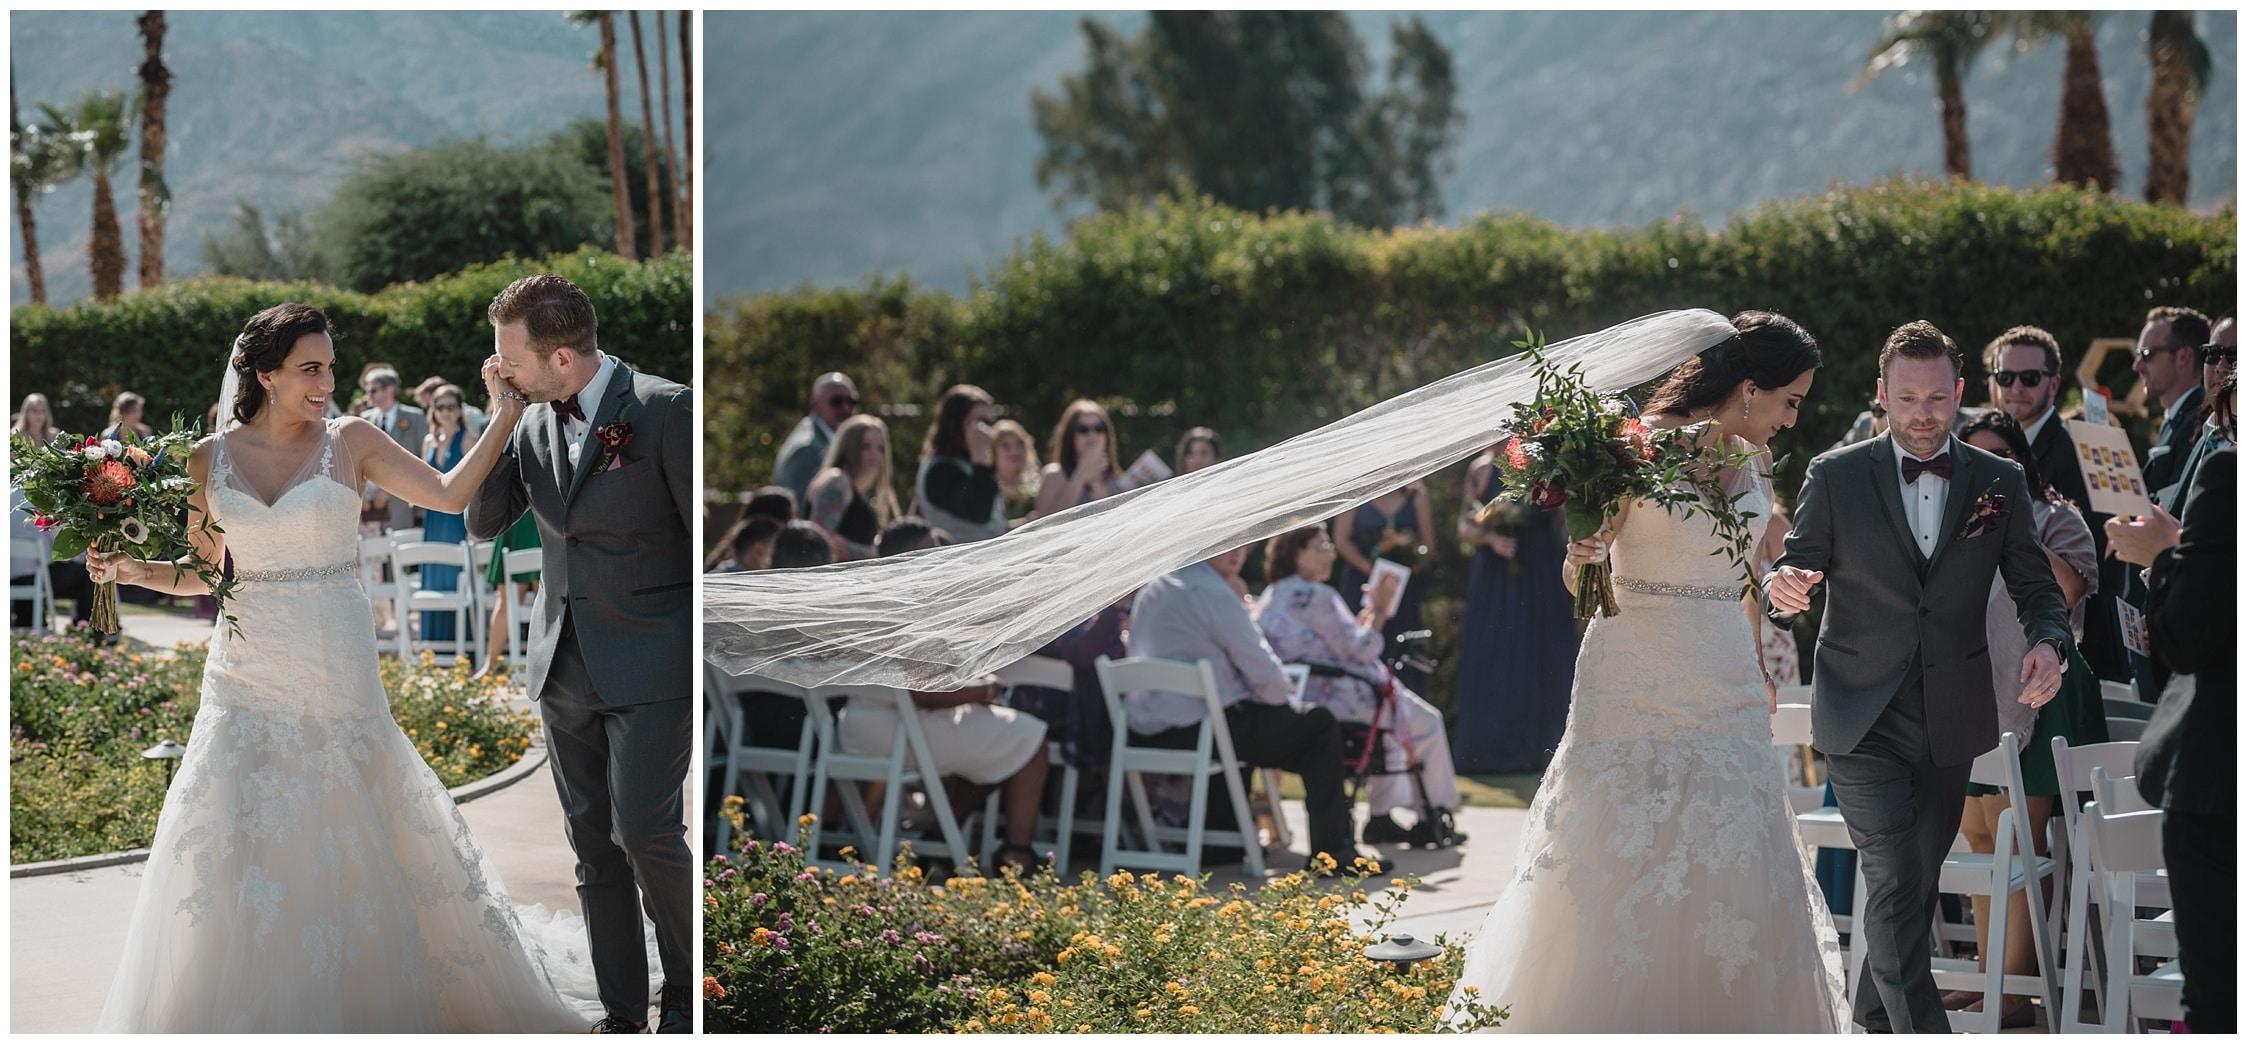 Wedding at Twin Palms Sinatra Estate with Karen & James 73